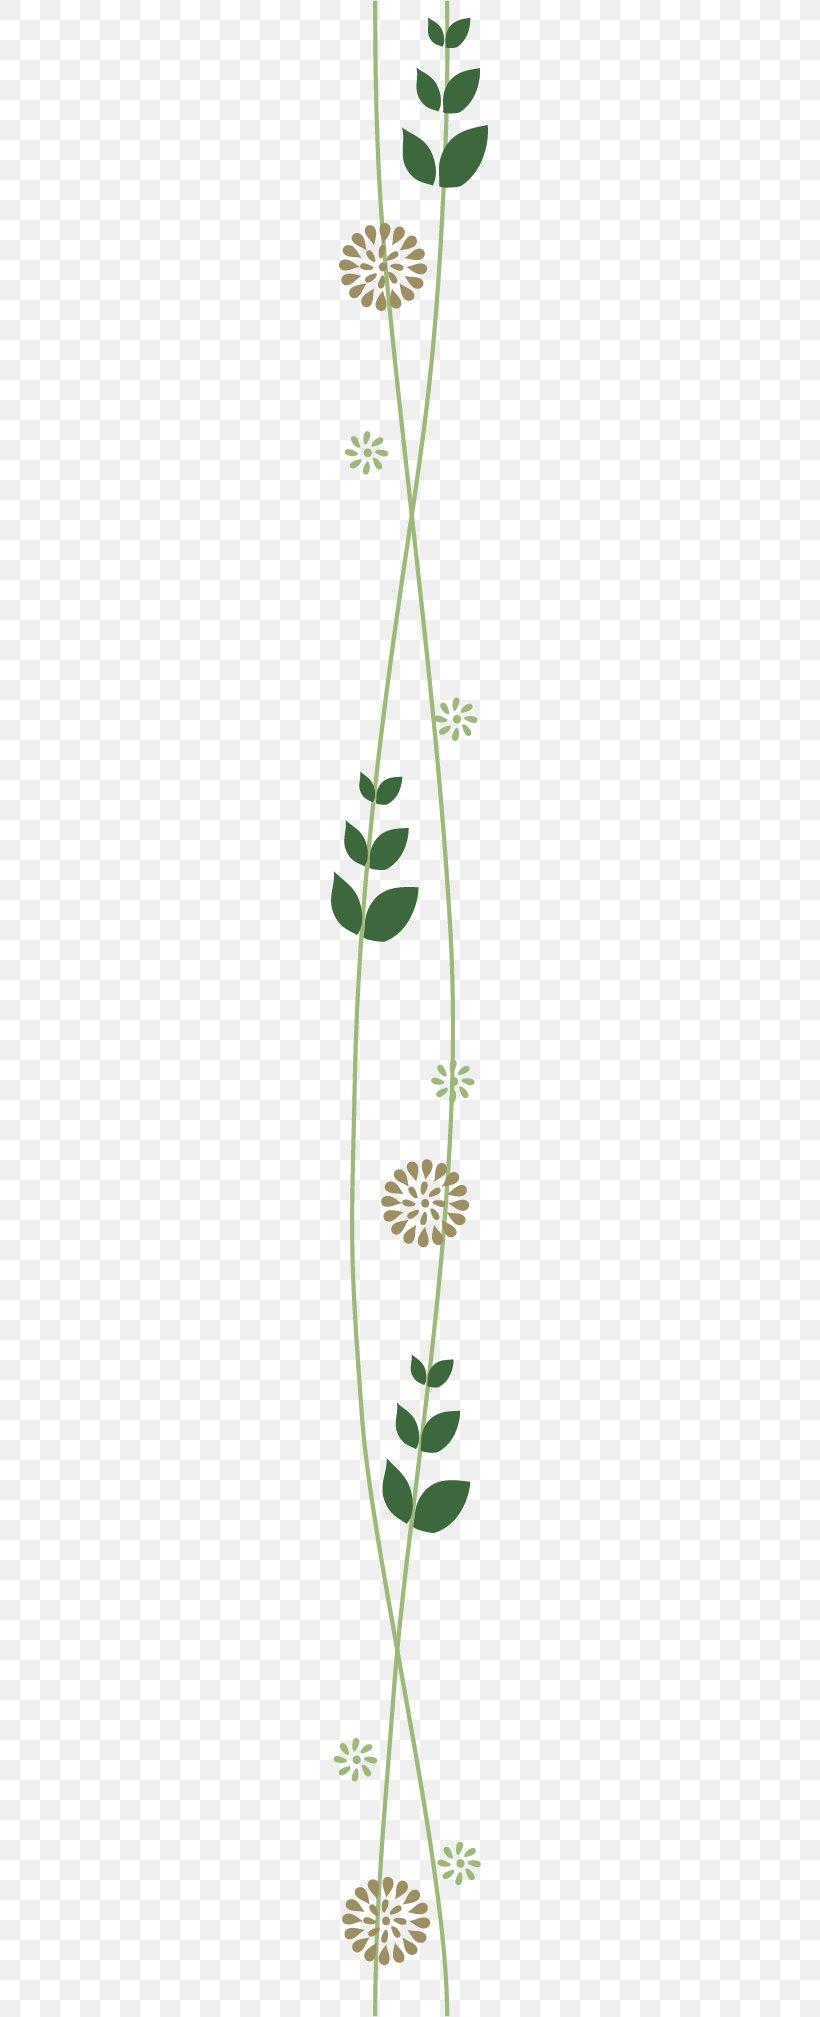 Grasses Plant Stem Leaf Green Flower, PNG, 157x2017px, Grasses, Branch, Family, Flora, Flower Download Free